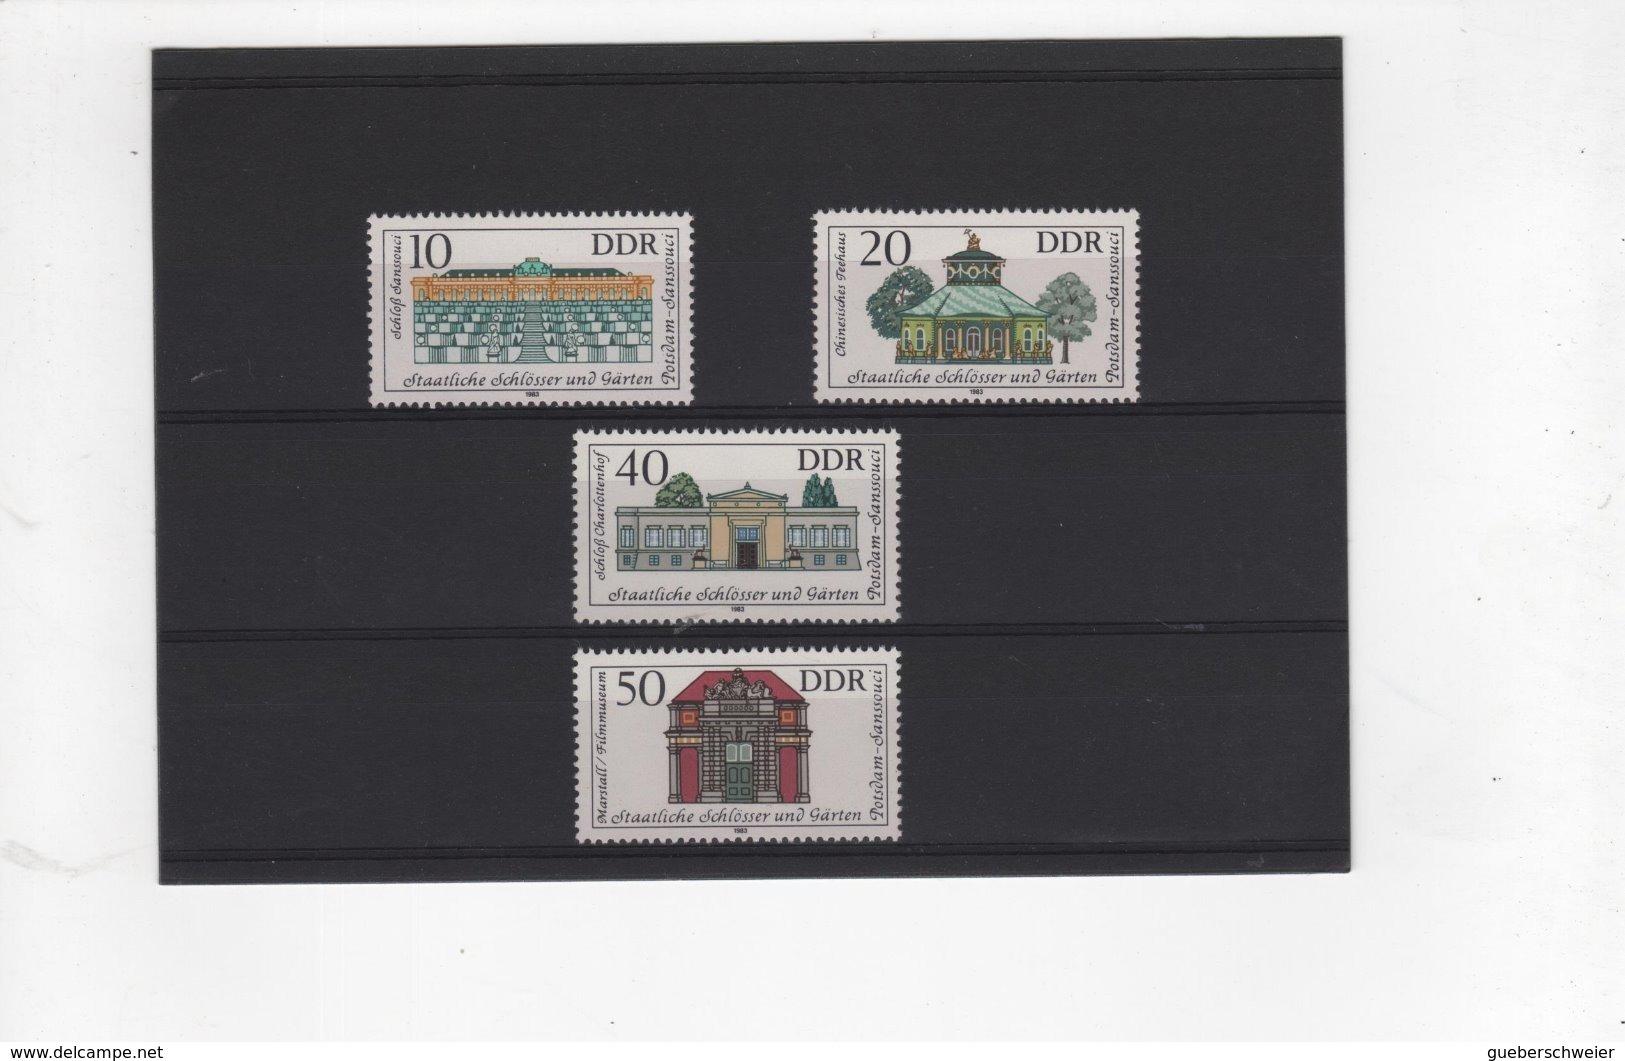 Paquet De 100 Cartes De Classement Lindner Réf. 869 Ft 158 X 110 Occasion Bon état - Karteikarten